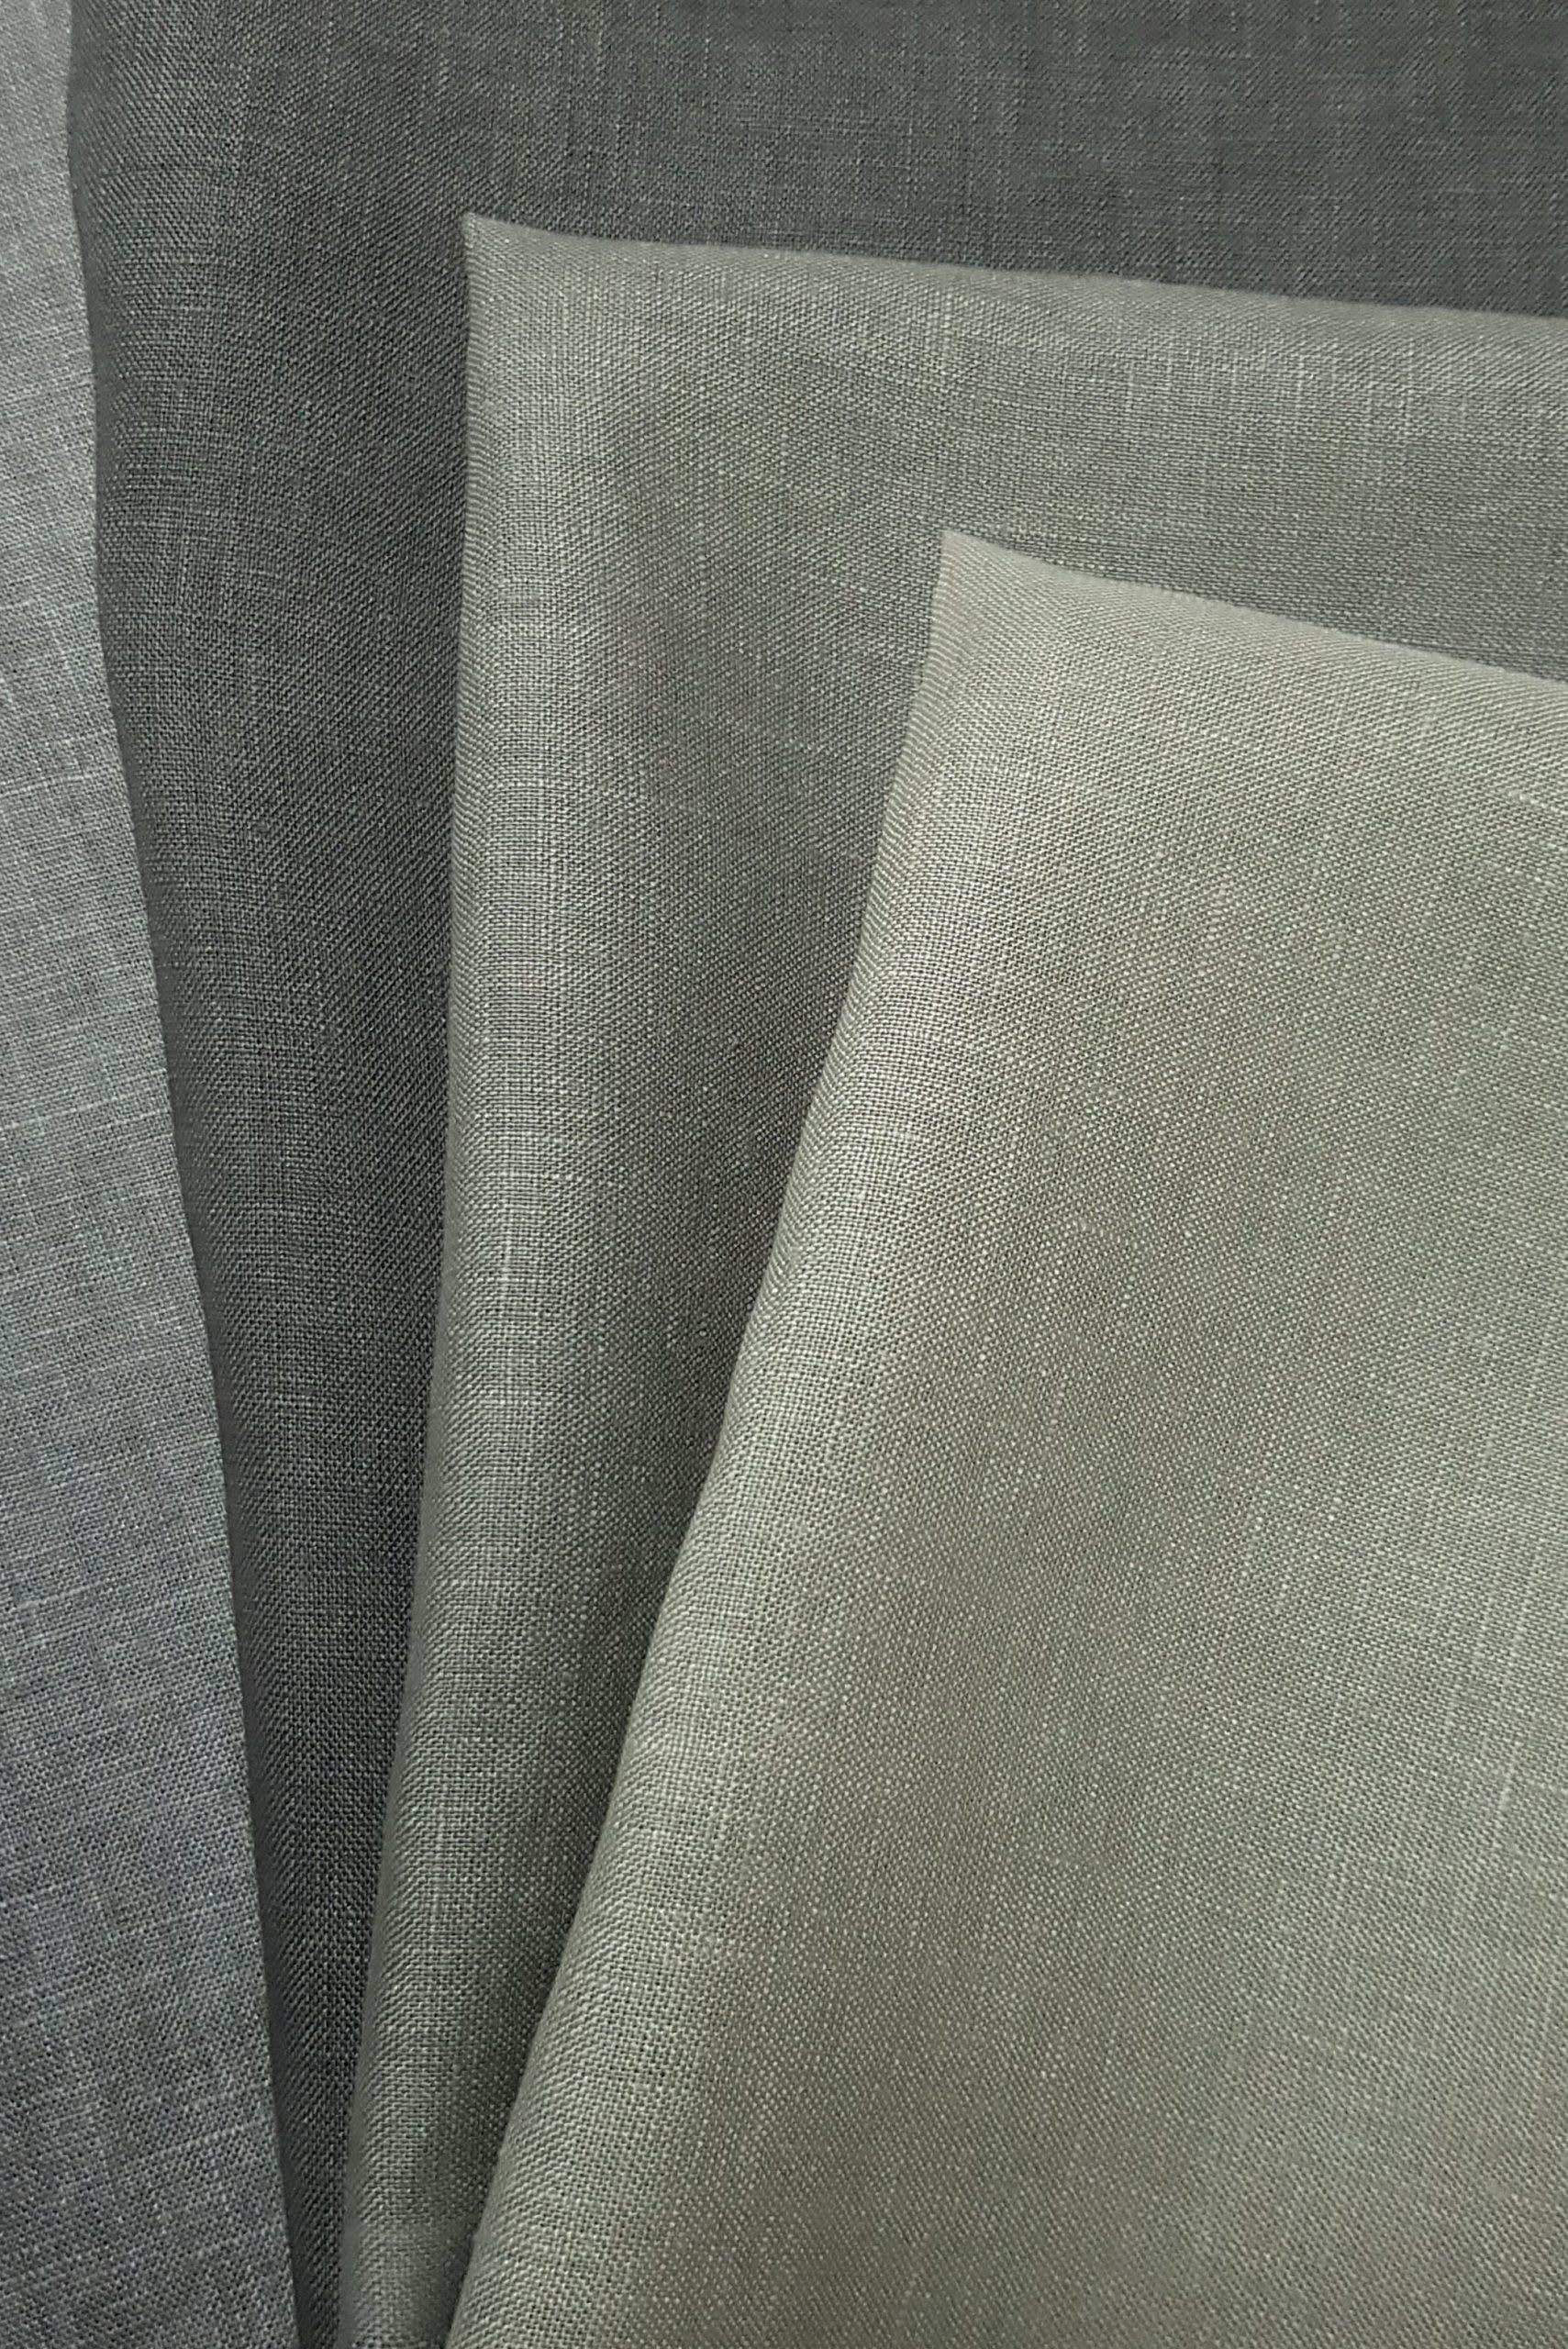 Shades of Dylon Smoke Grey hand dyed